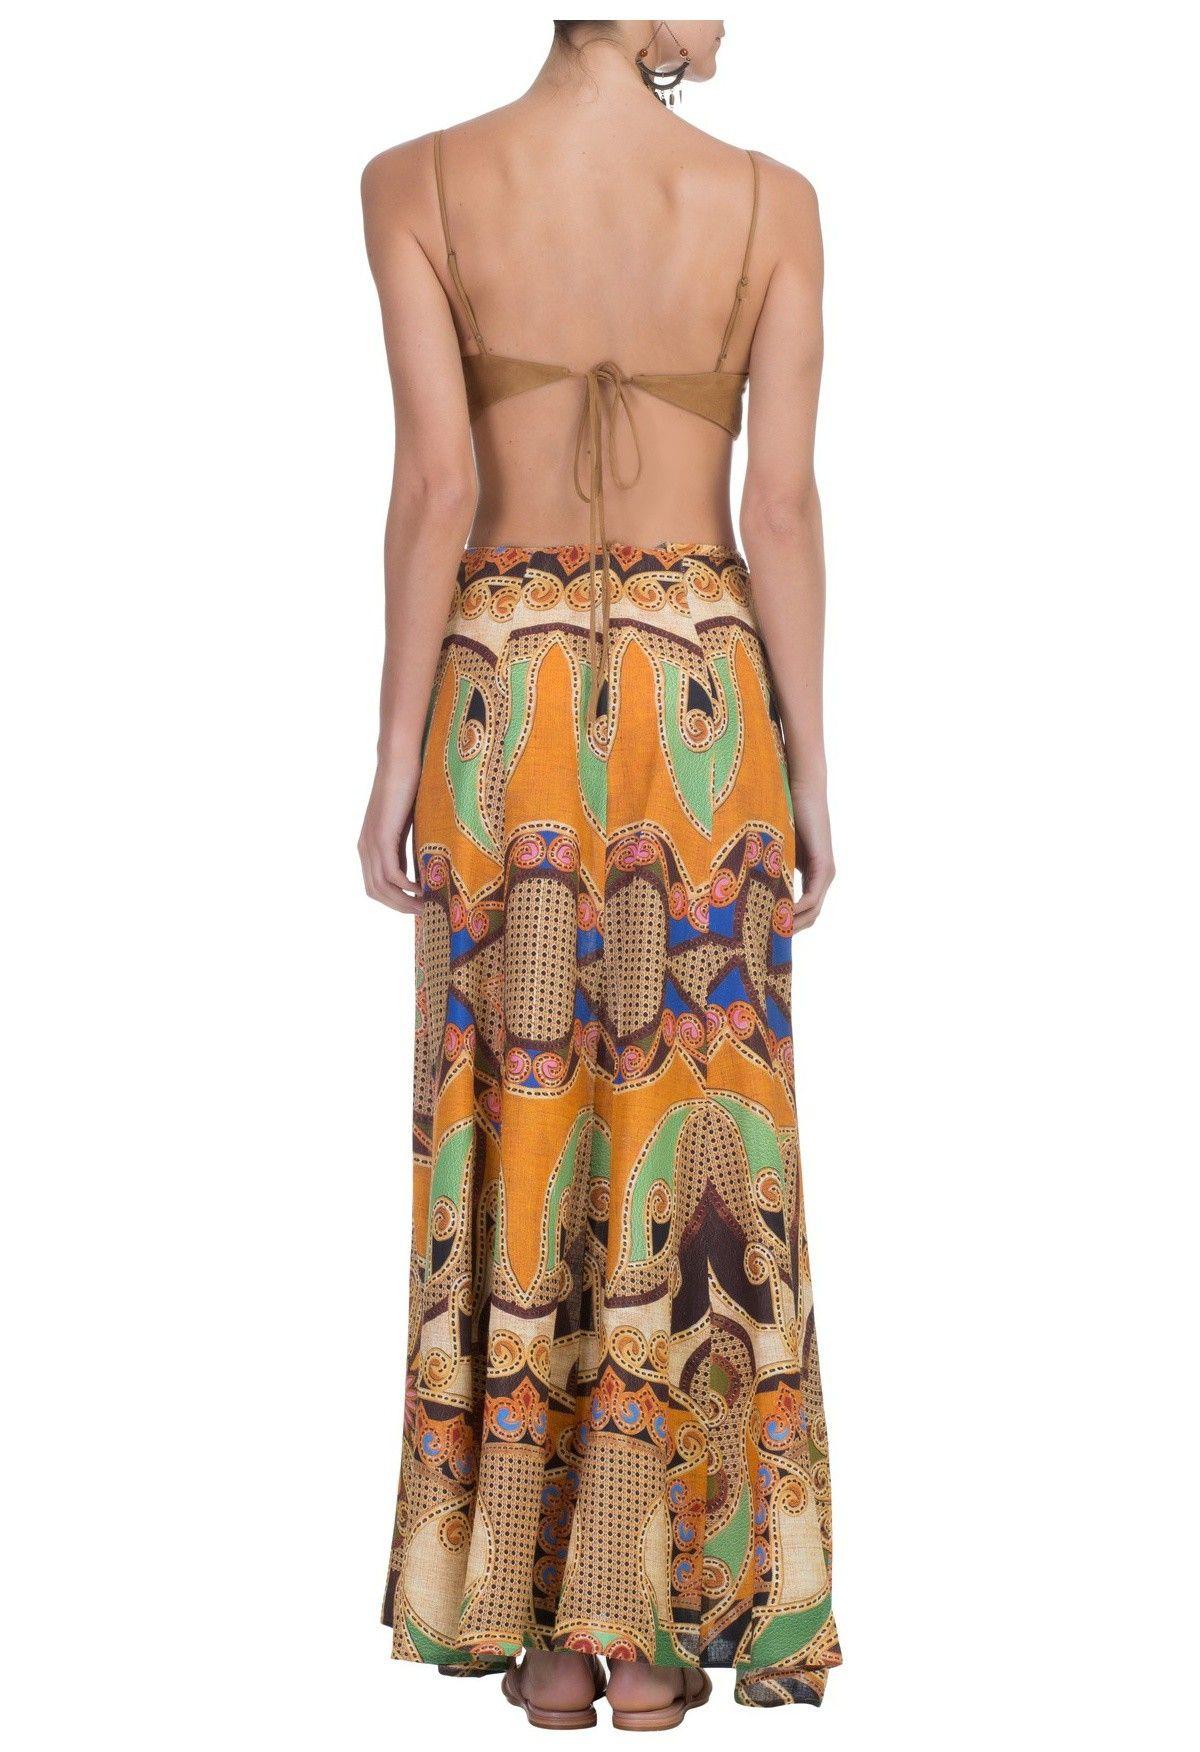 5390bbb03 FARM - Vestido longo Nova Olinda - marrom - OQVestir